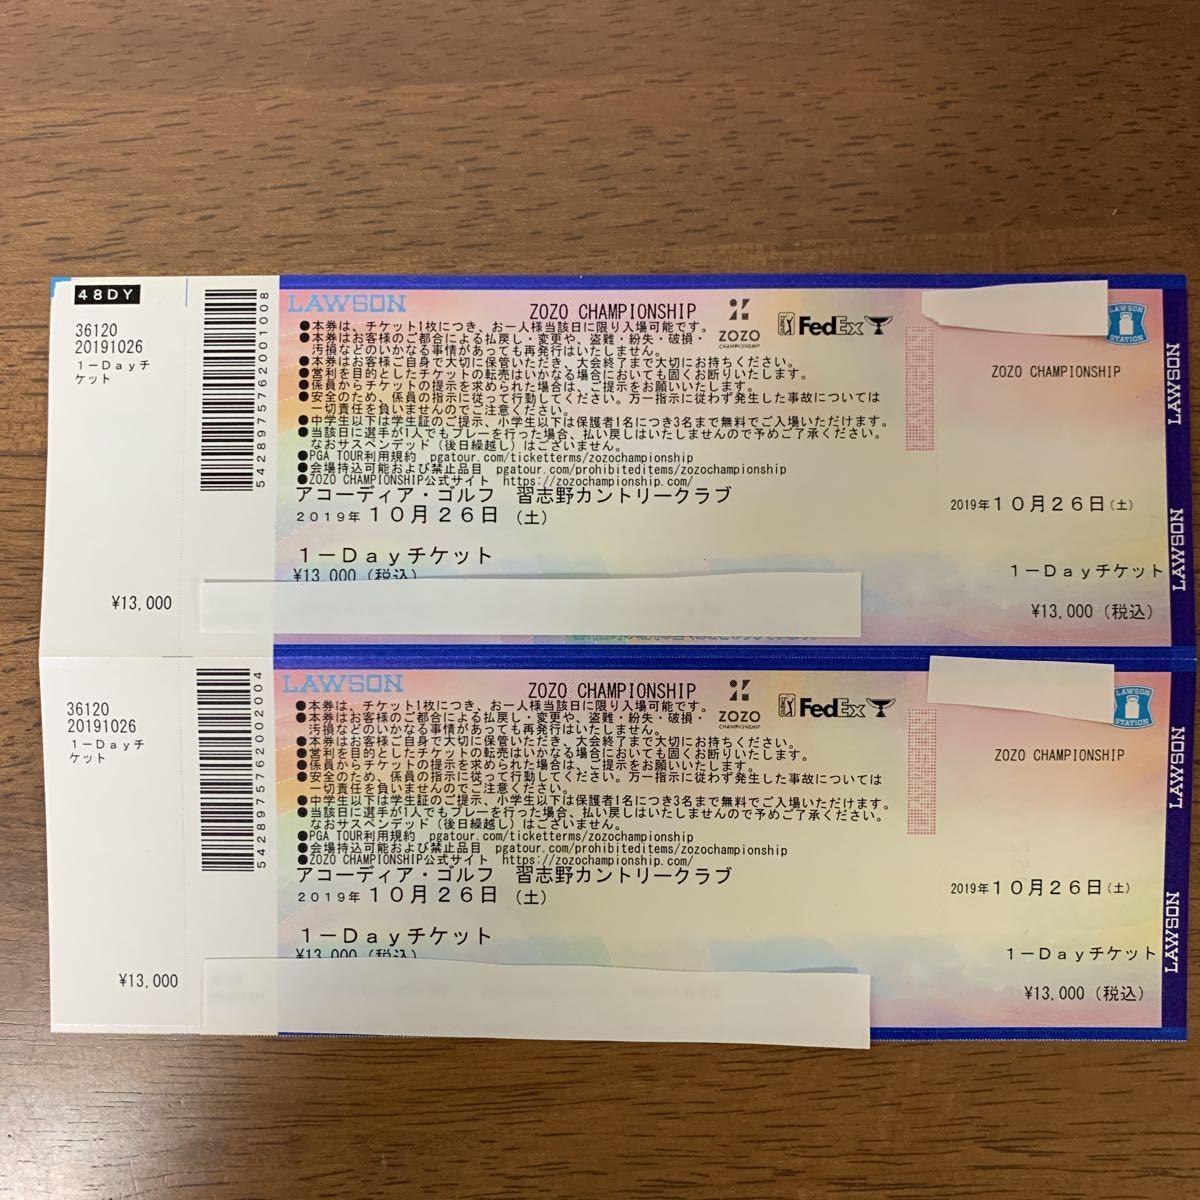 ZOZO Championship 3日目 10/26(土) 2枚 (駐車場無し) _画像2